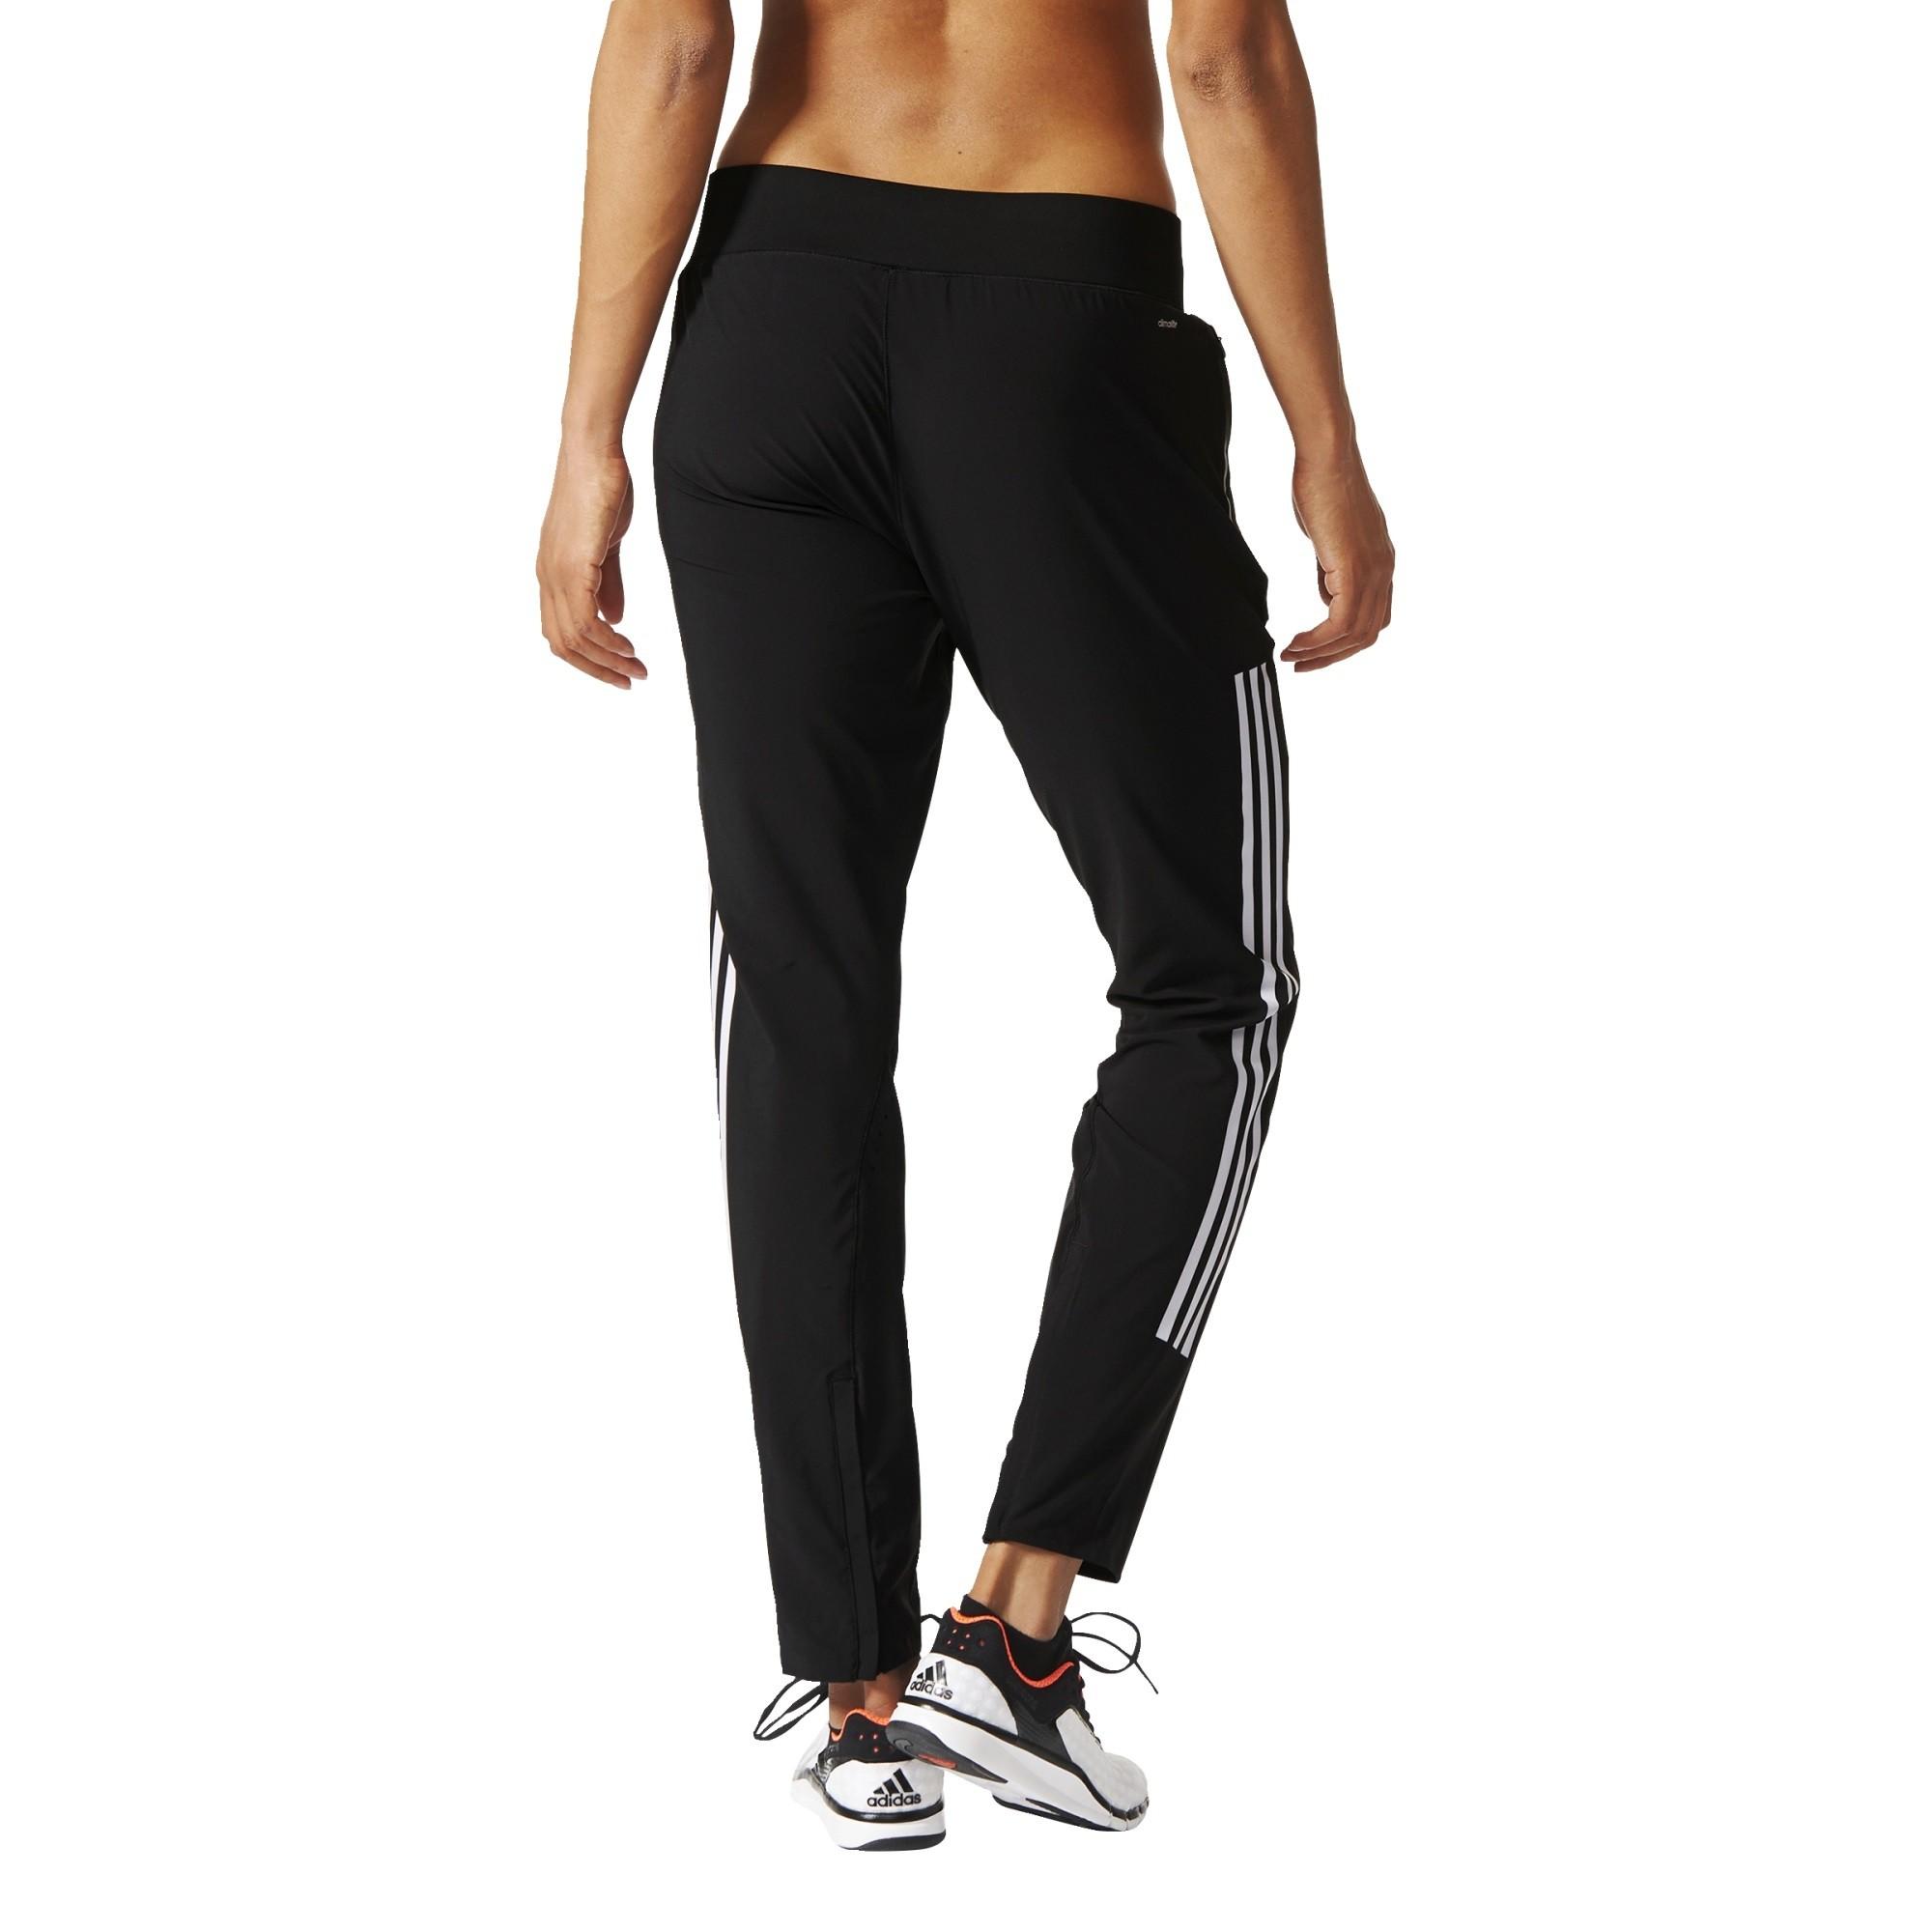 f5190eb3356a0a adidas Damen Trainingshose WOVEN PANT Jogginghose Fitnesshose ...